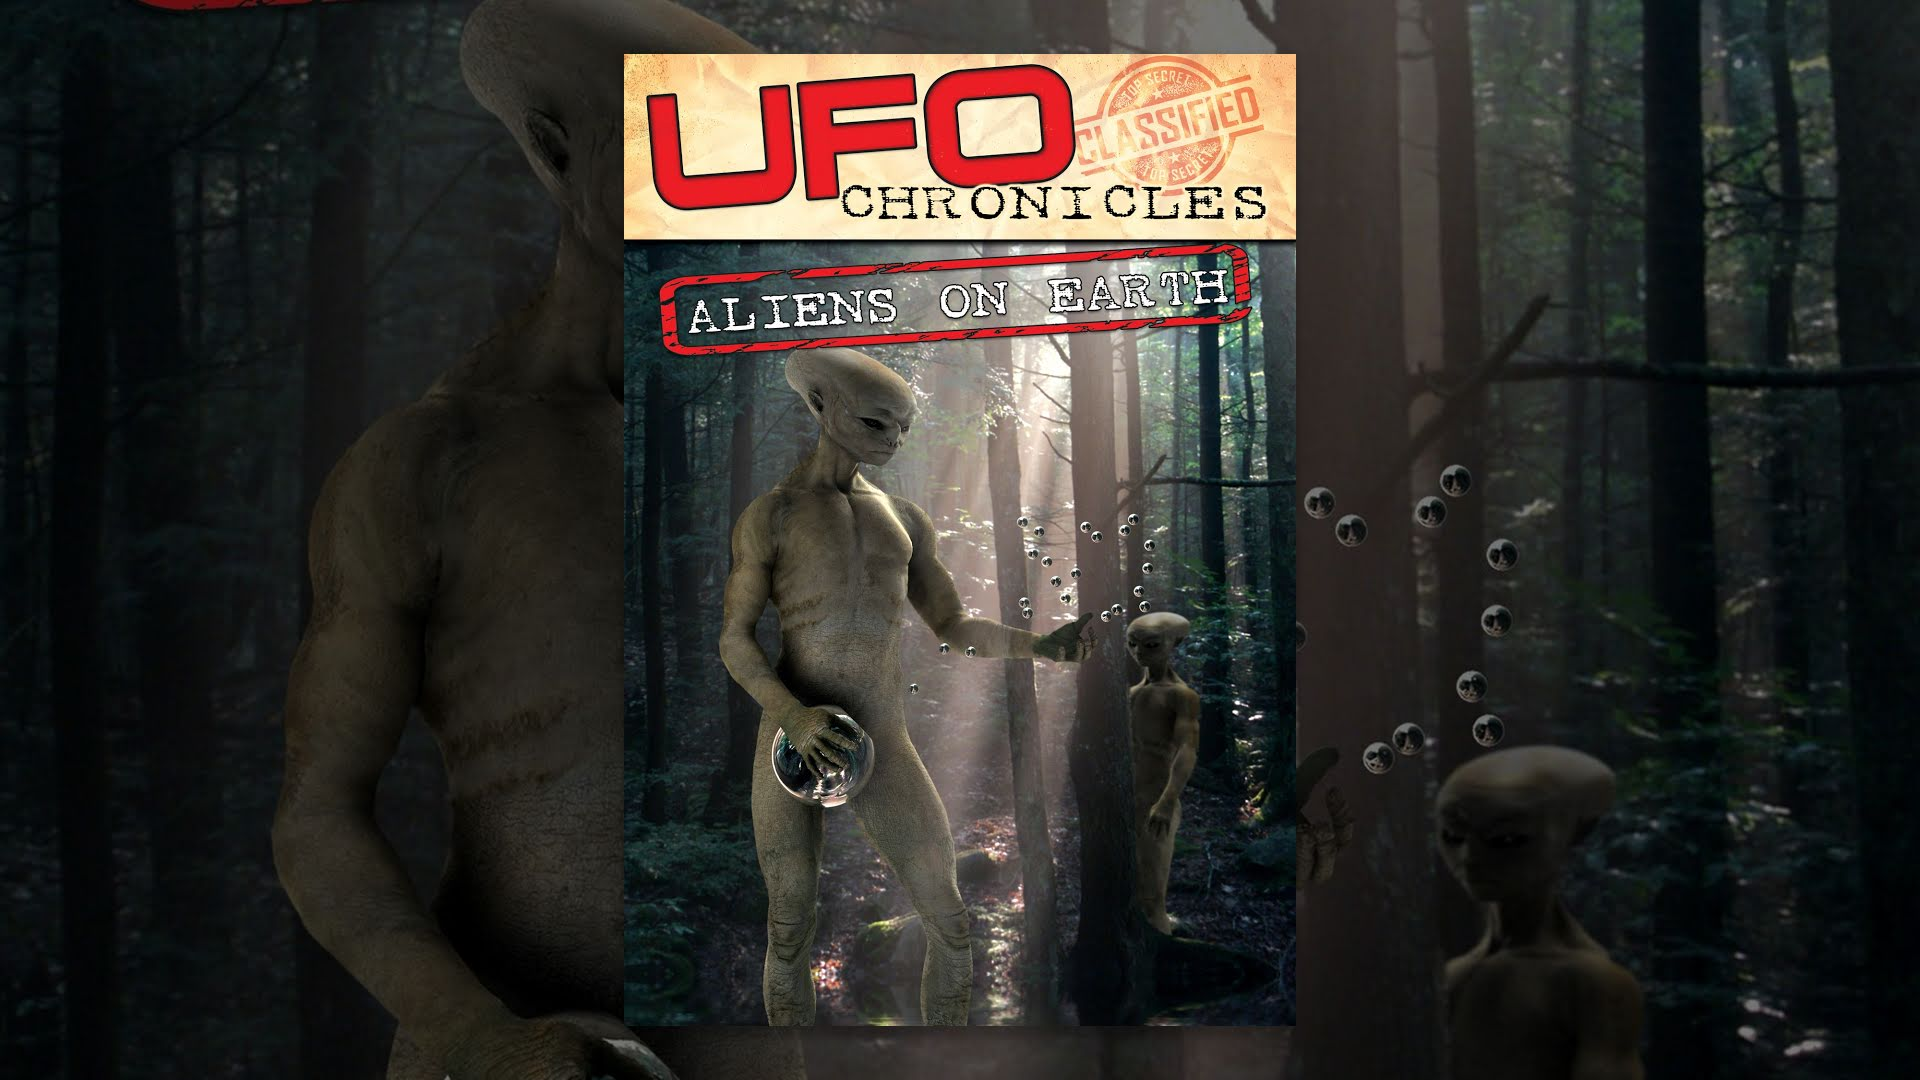 UFO Chronicles Aliens on Elysium Poster